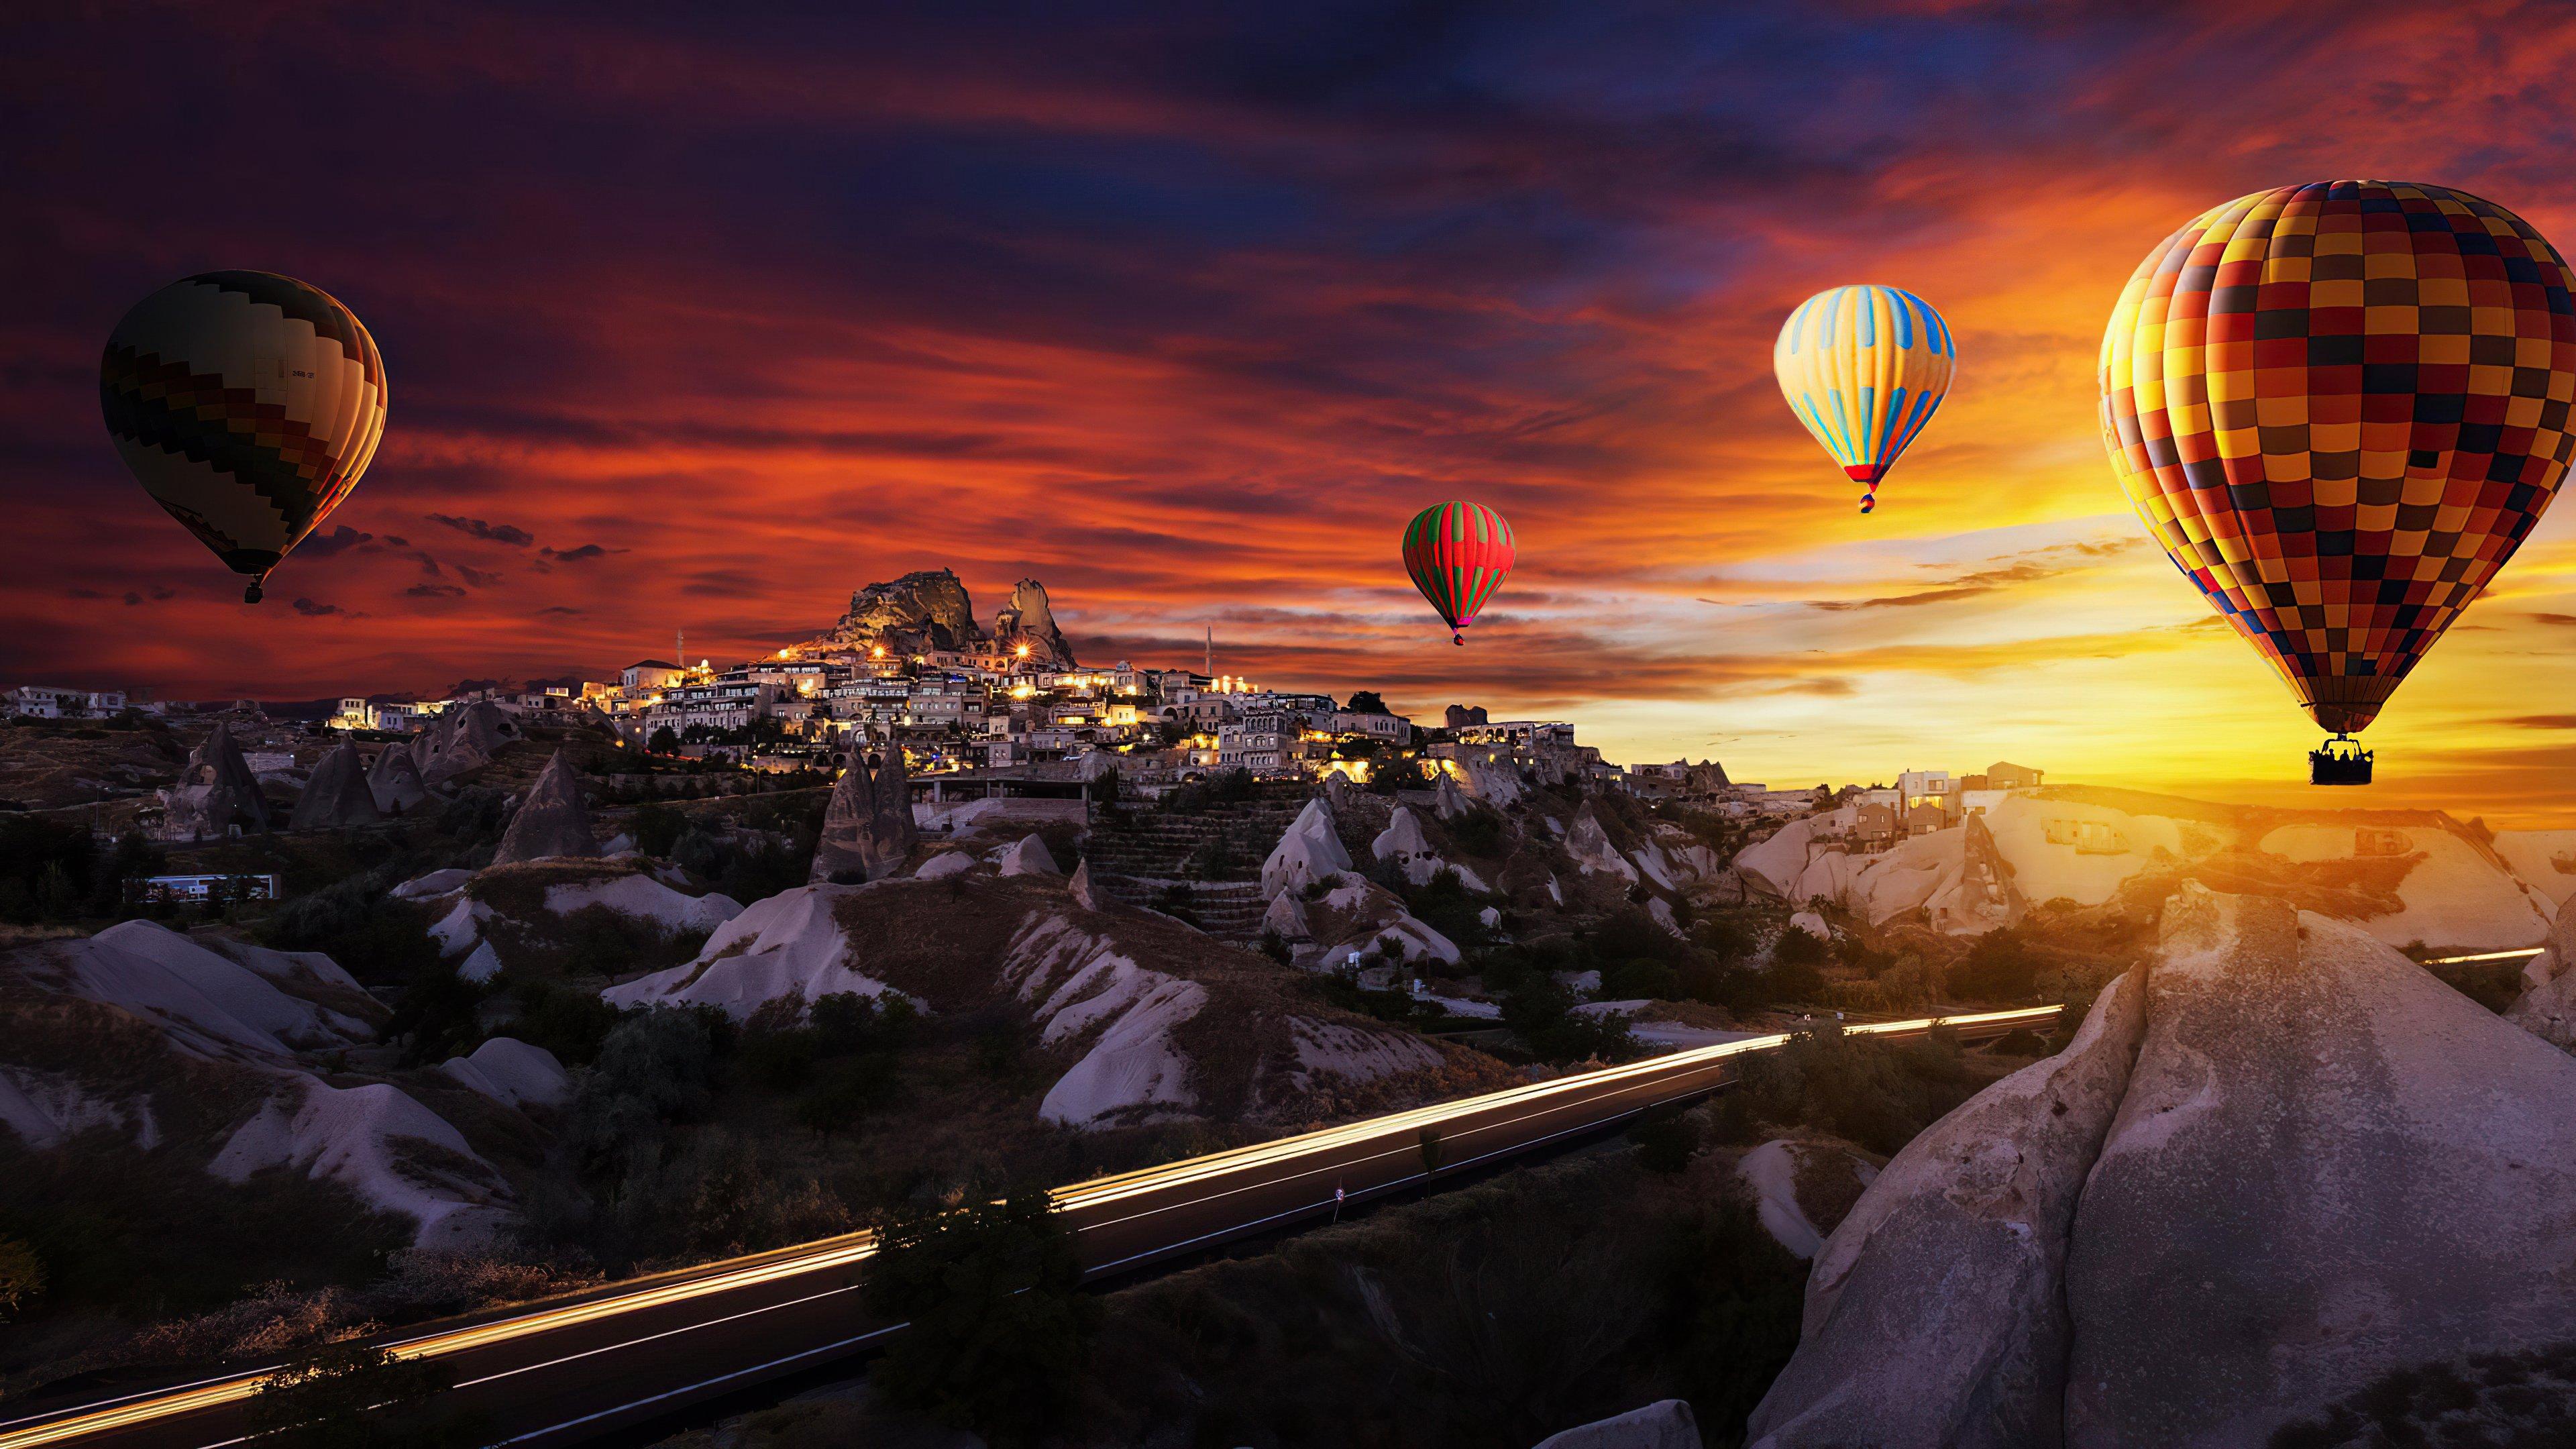 Wallpaper Hot air ballons over Goreme